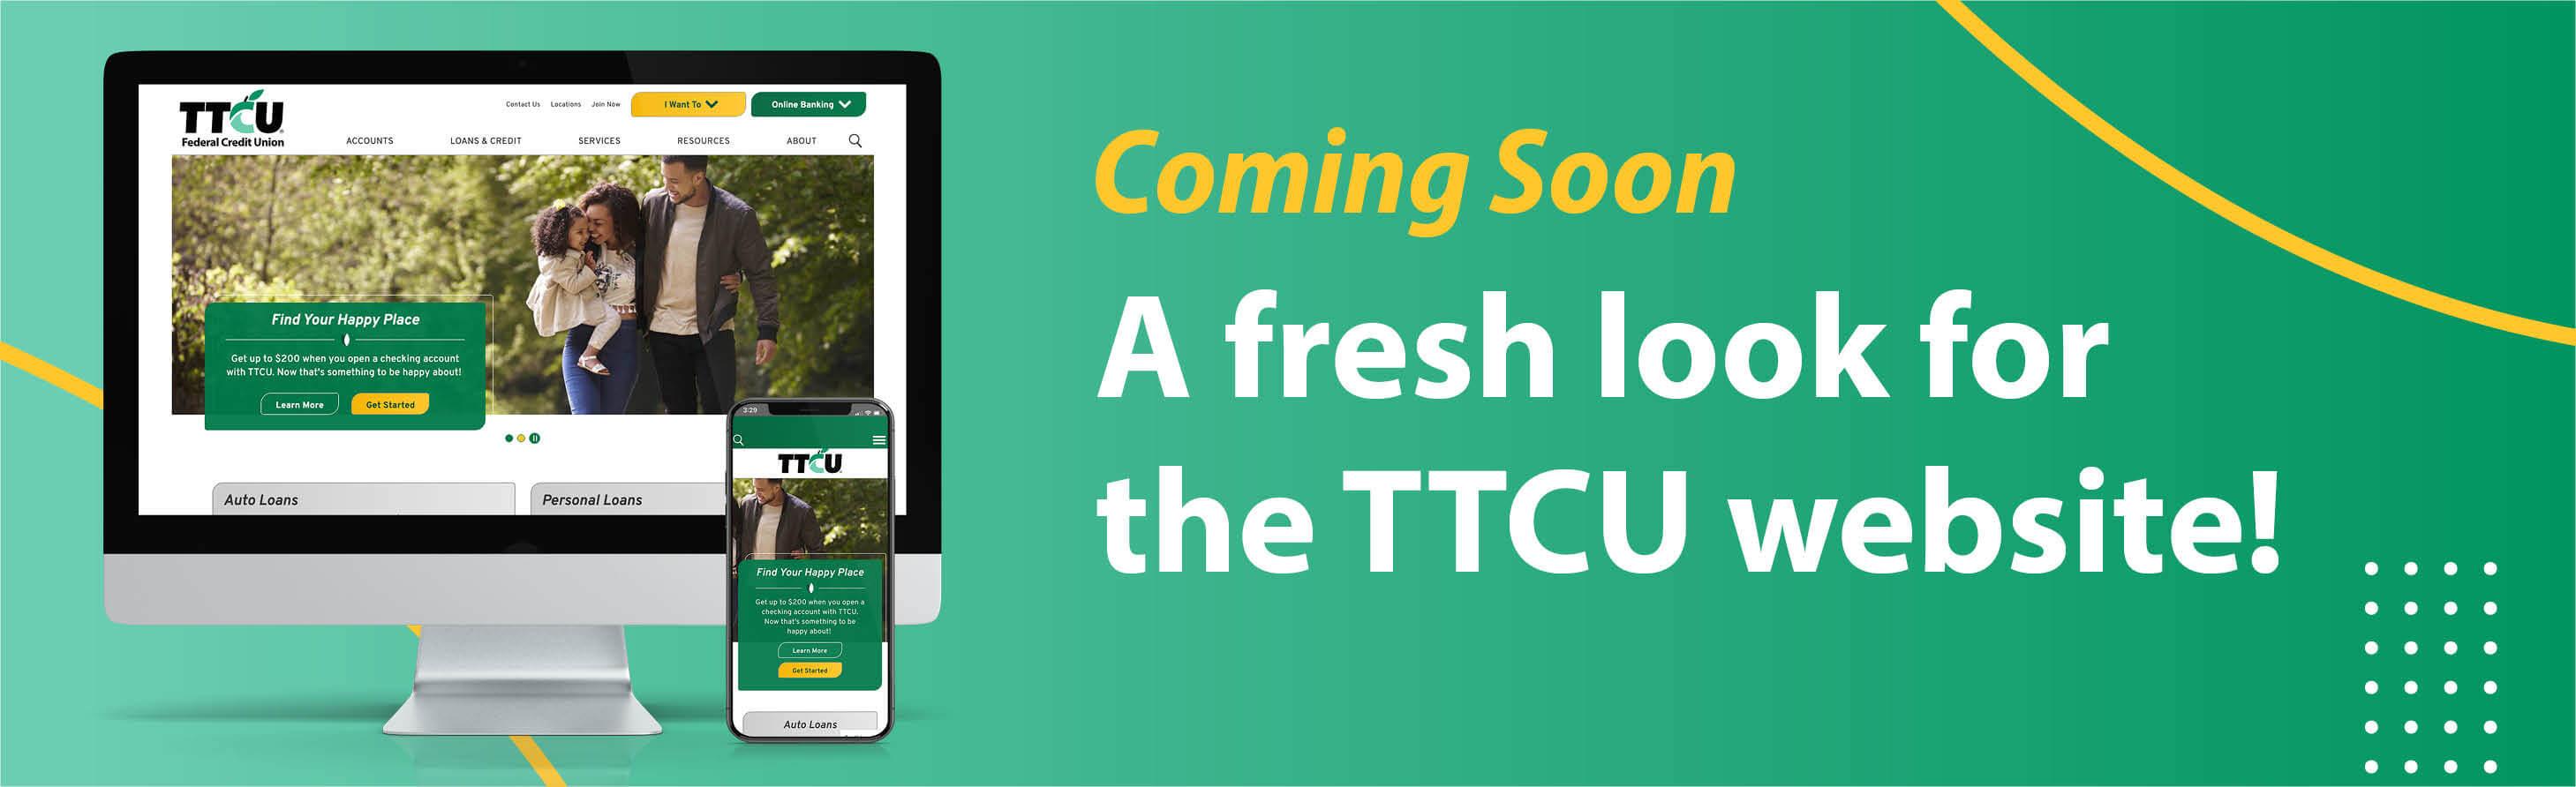 A fresh look for the TTCU website